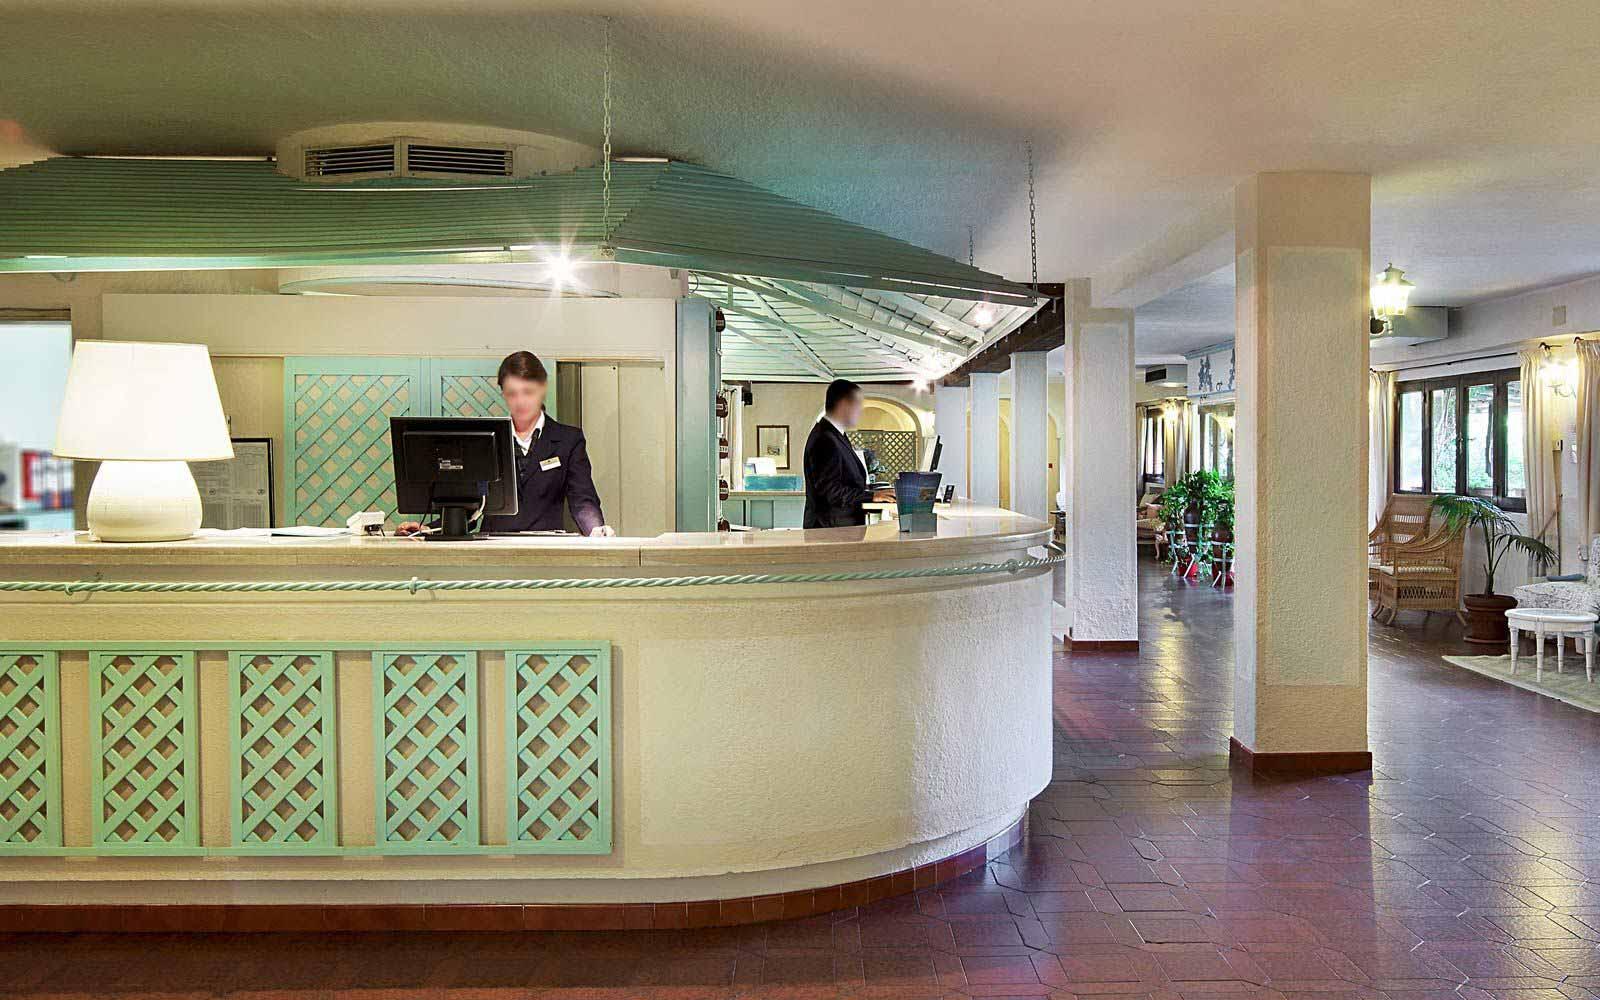 Reception at Grand Hotel Smeraldo Beach